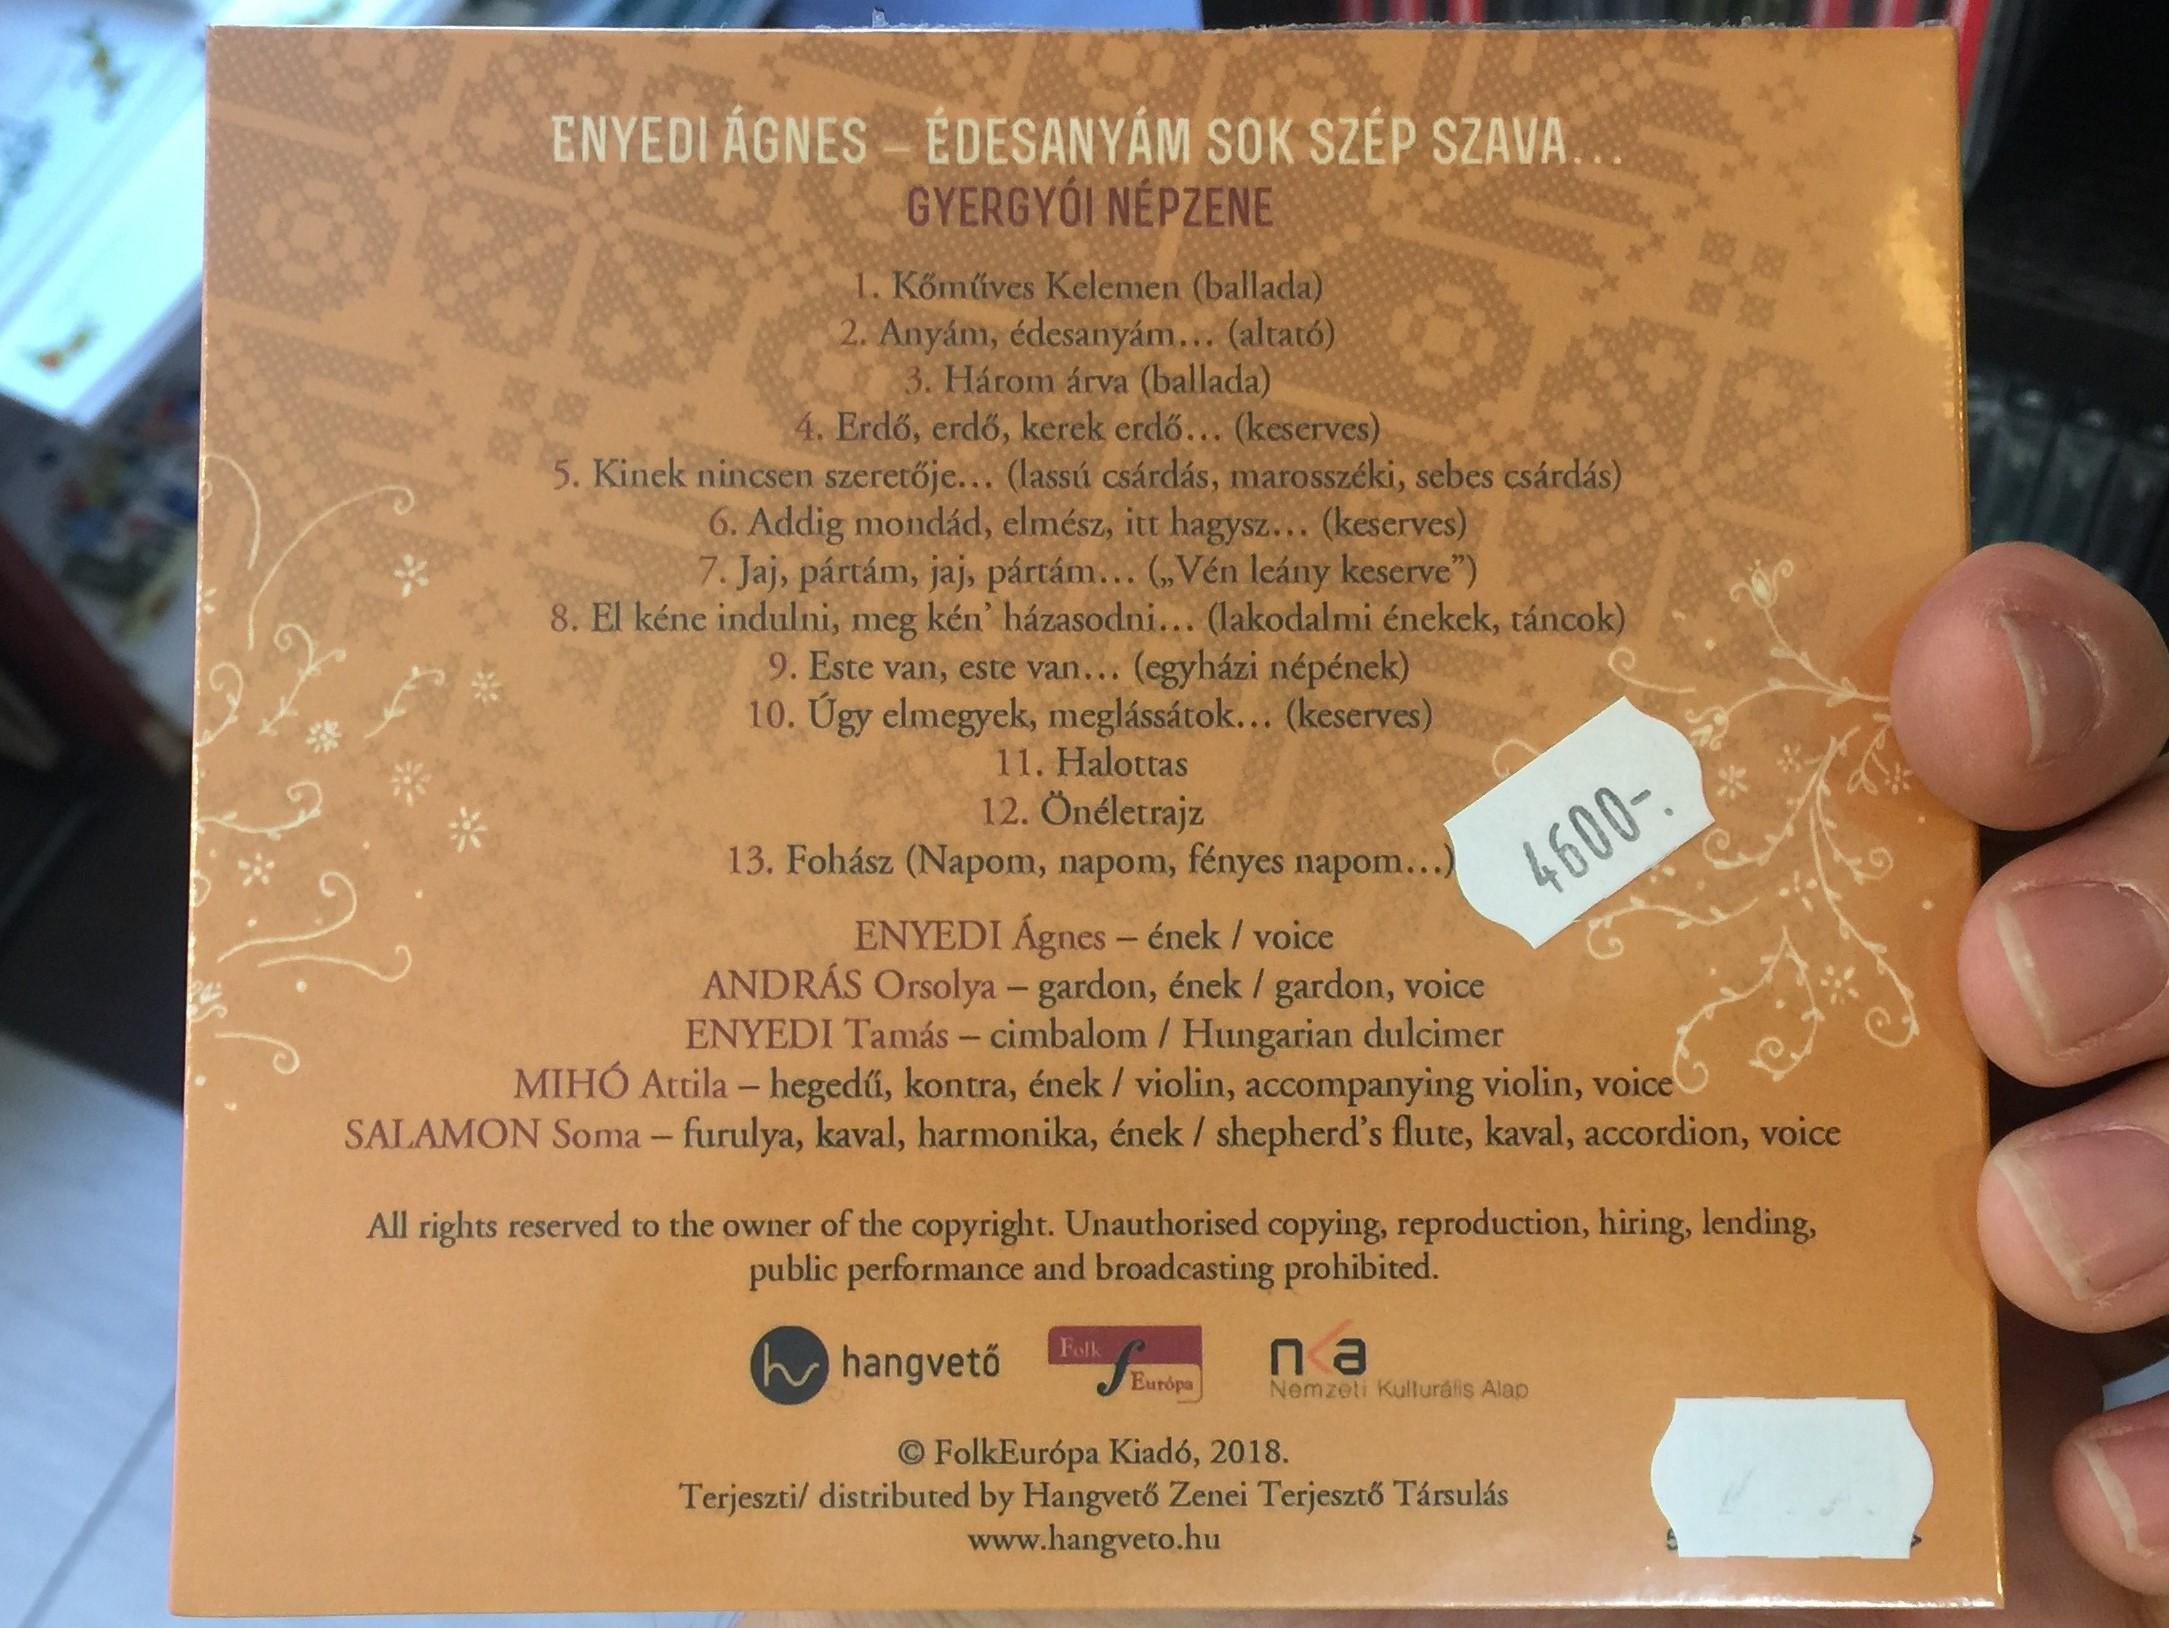 enyedi-gnes-desany-m-sok-sz-p-szava...-gyergy-i-n-pzene-folk-eur-pa-audio-cd-2018-2-.jpg